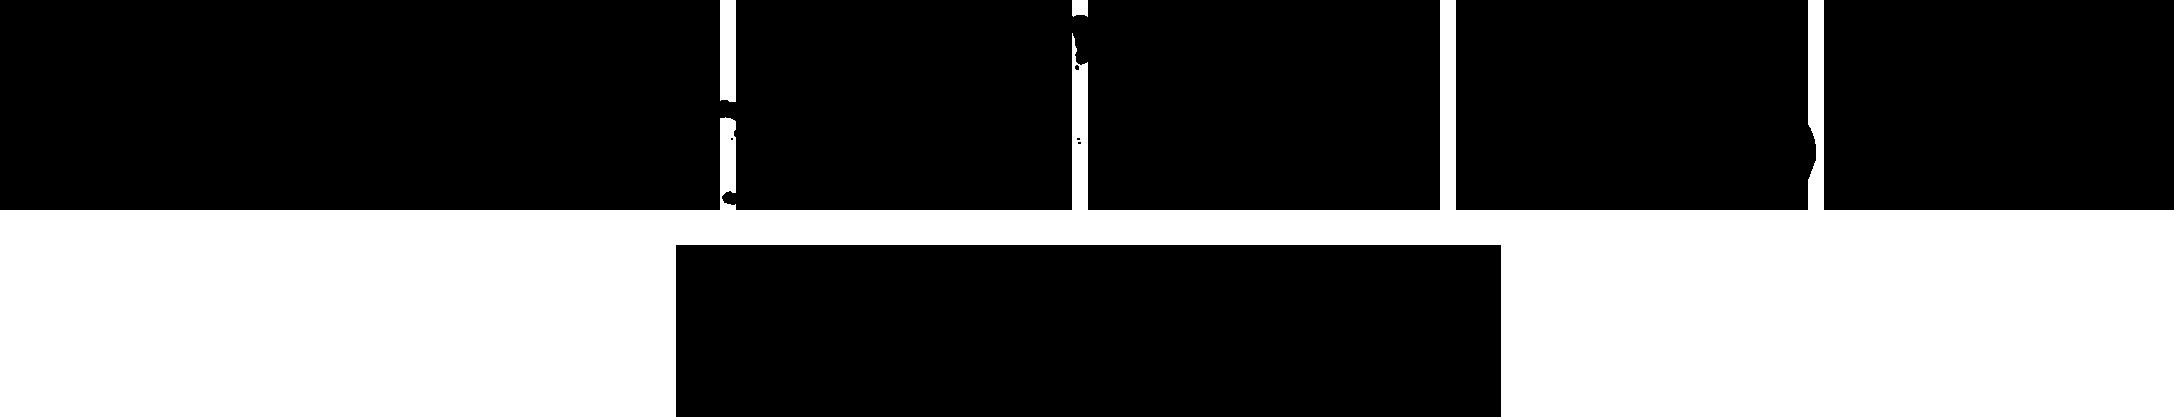 vfhr-logo.png